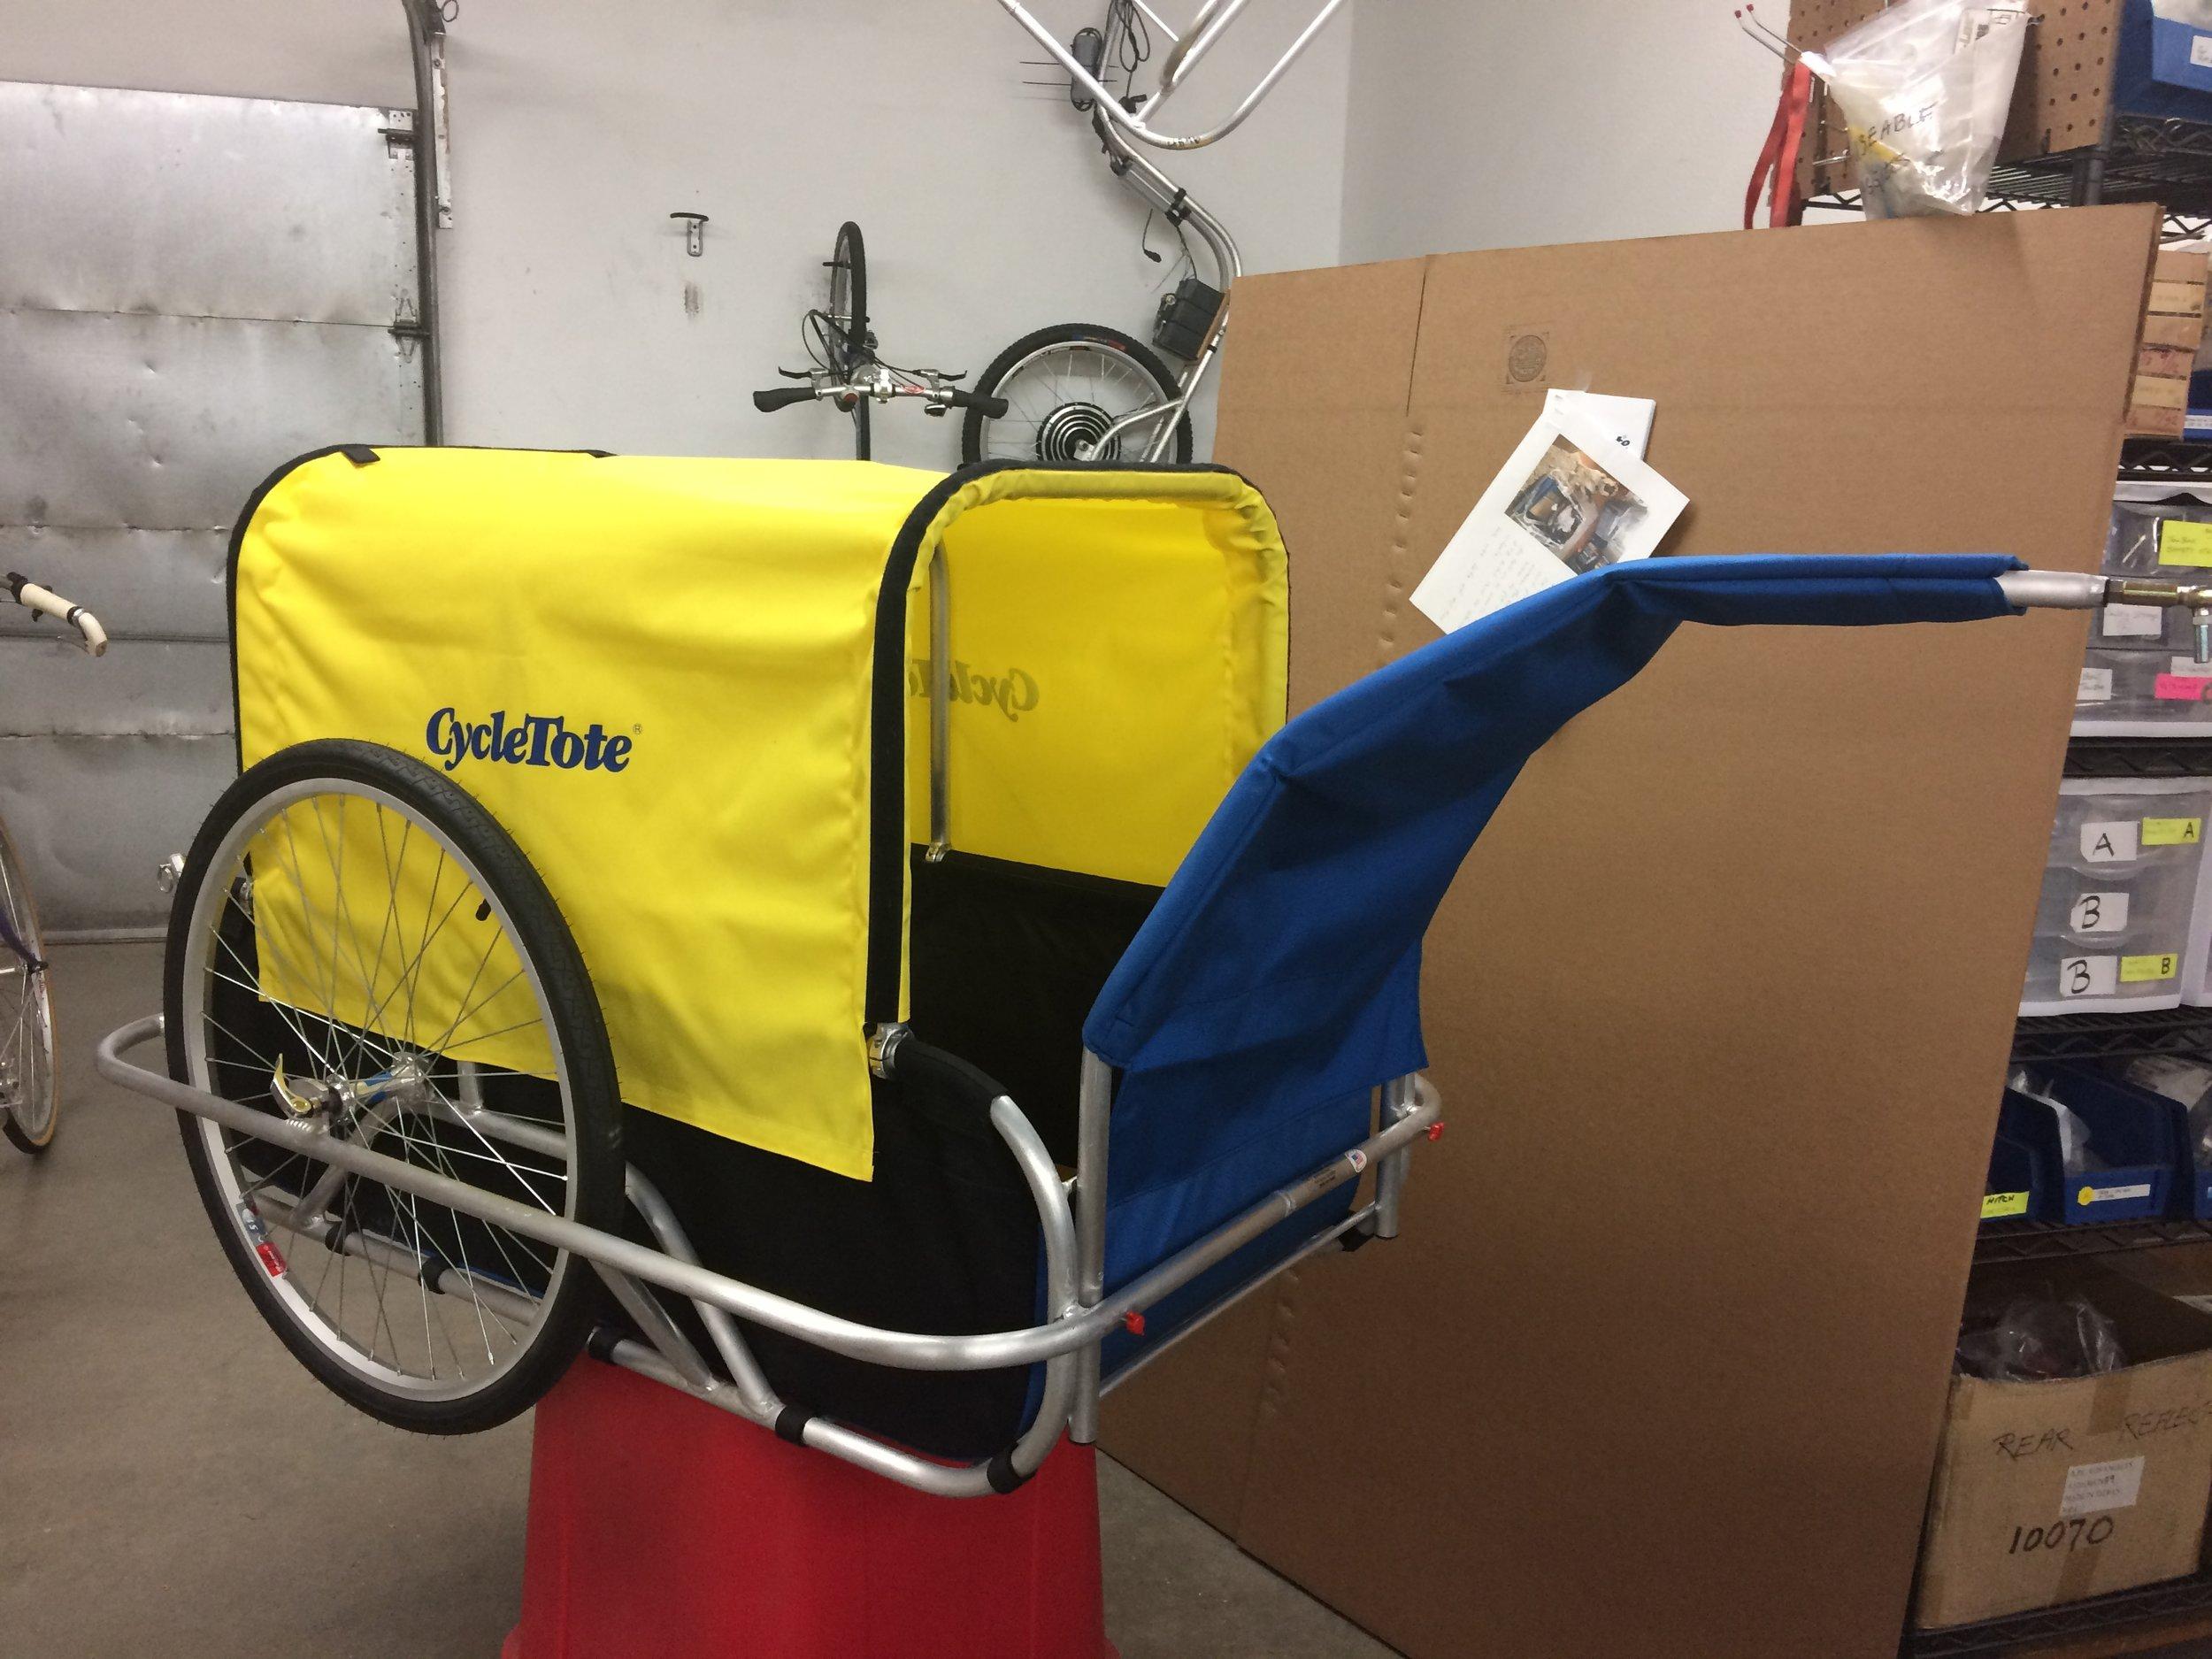 dog-bike-trailer-training-fort-collins-cycletote